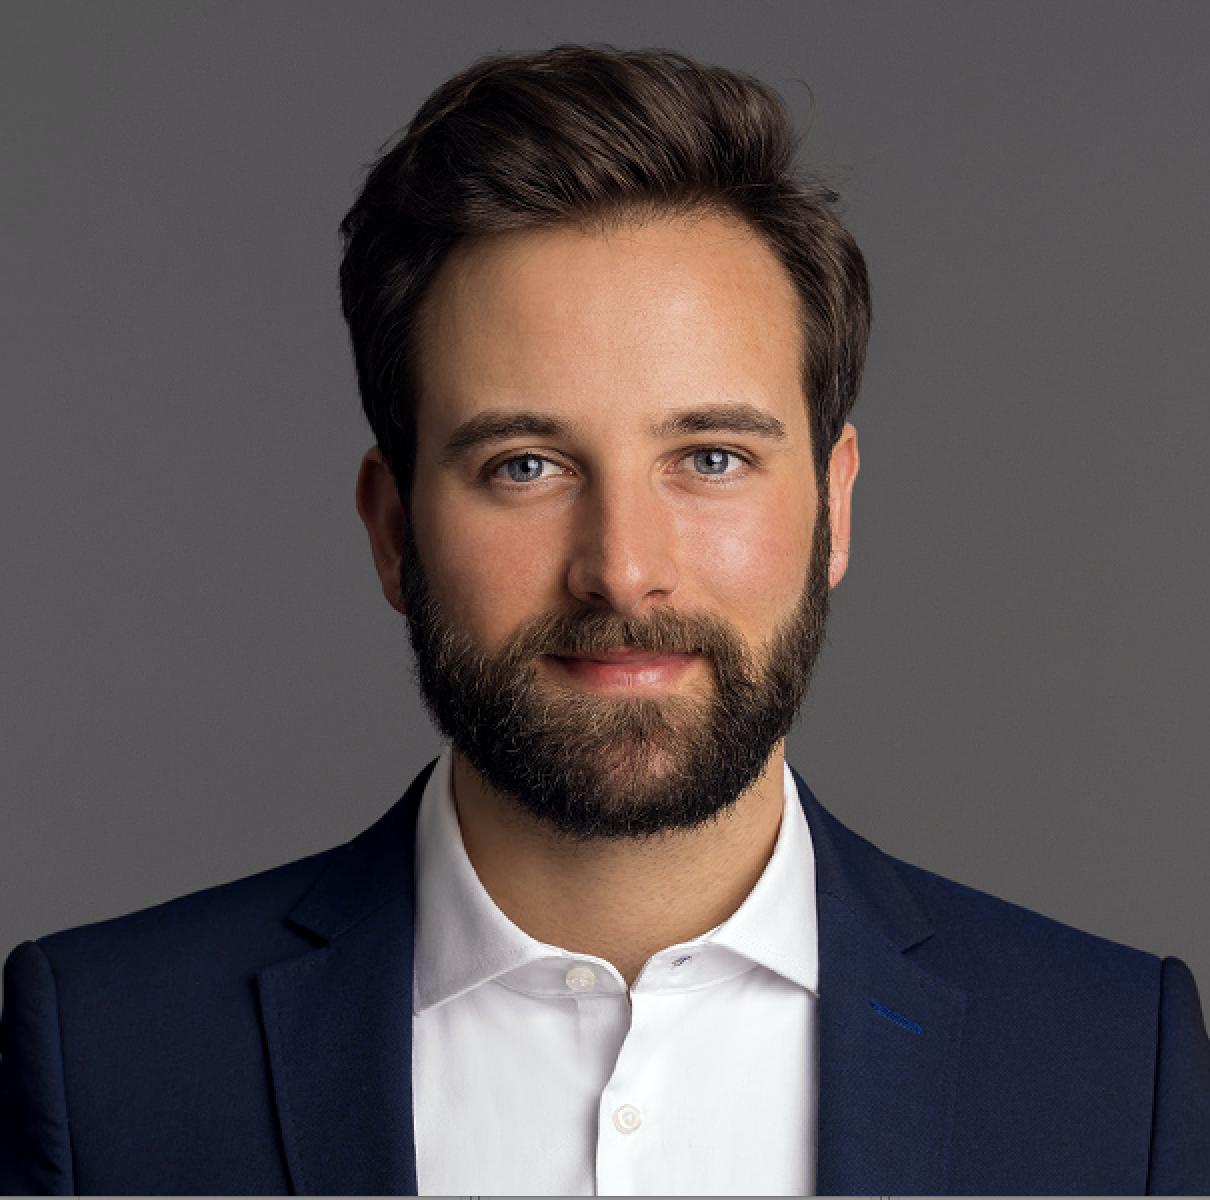 Portrait von Nicolas Brendel